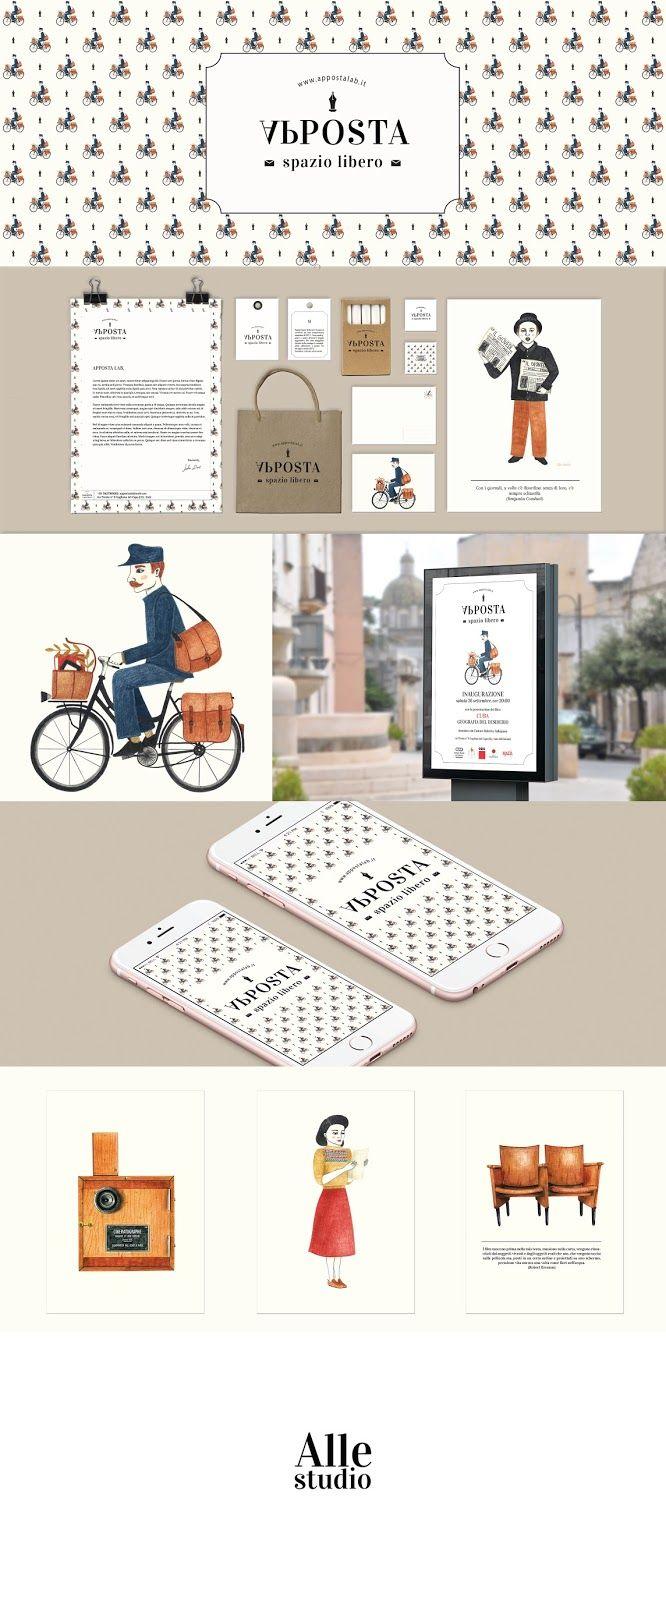 #identity #apposta #graphic #illustration #cinema #logo #postman #iphon #branding #brand